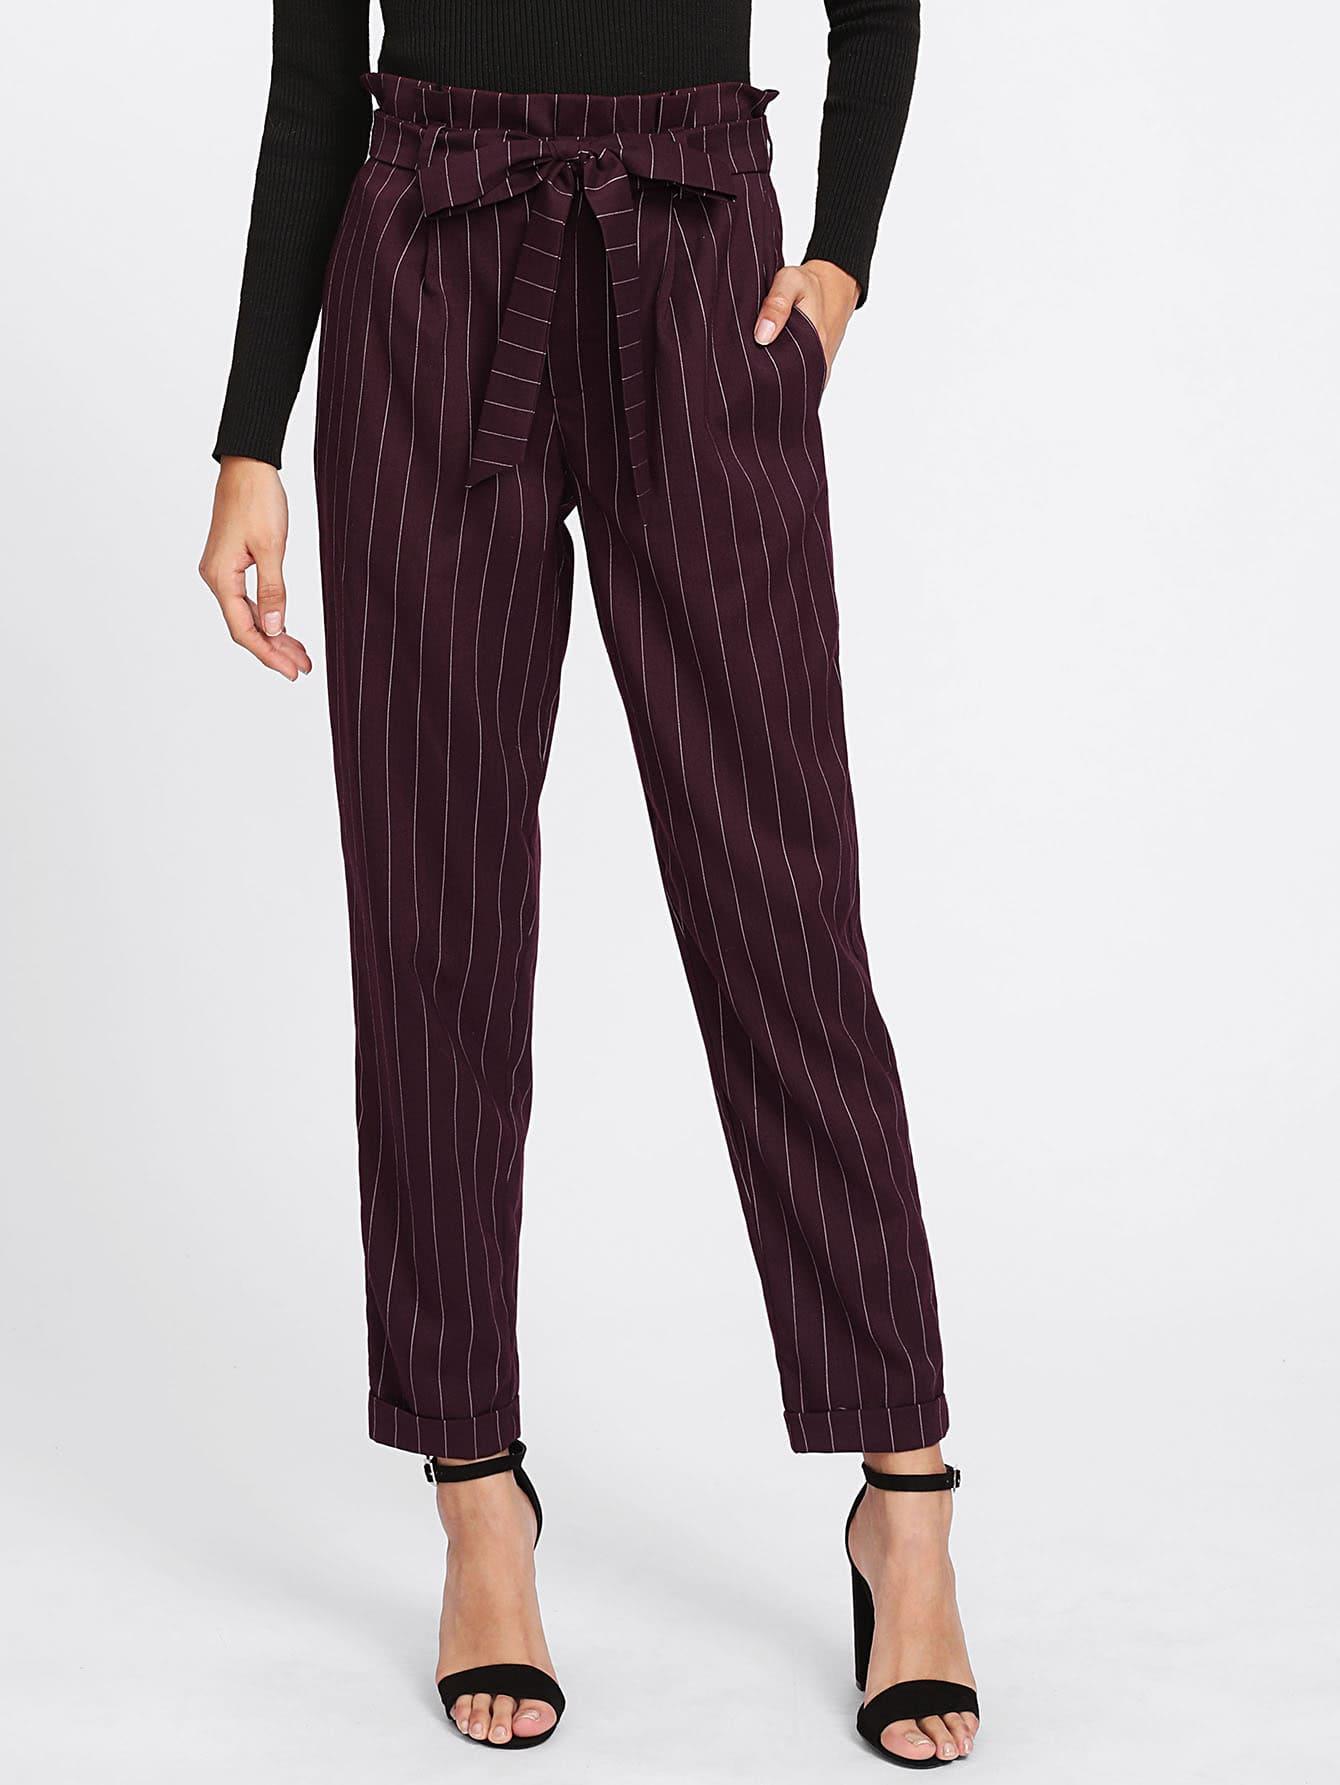 Tie Waist Cuffed Pinstripe Peg Pants